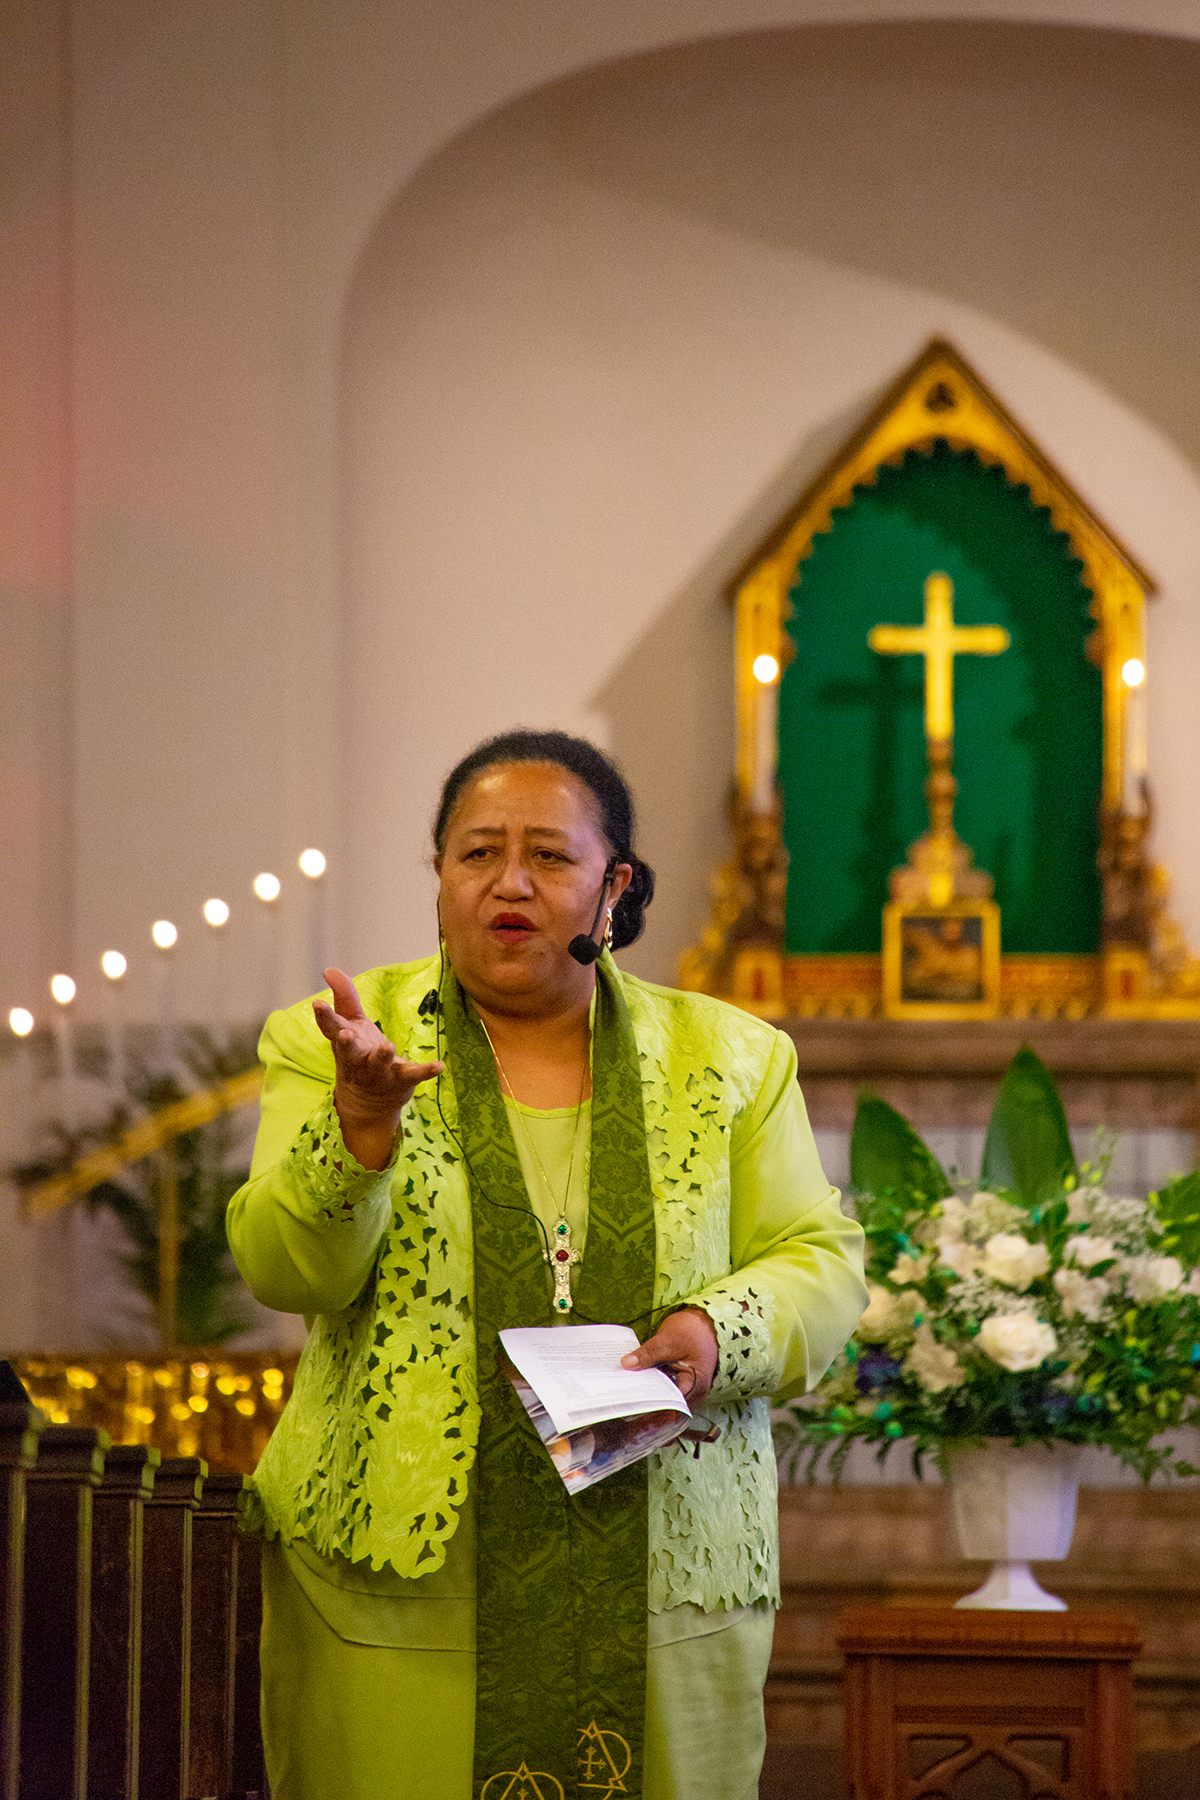 Pastor 'Ofa uepi preaching during worship at St. Luke's UMC in Richmond, CA